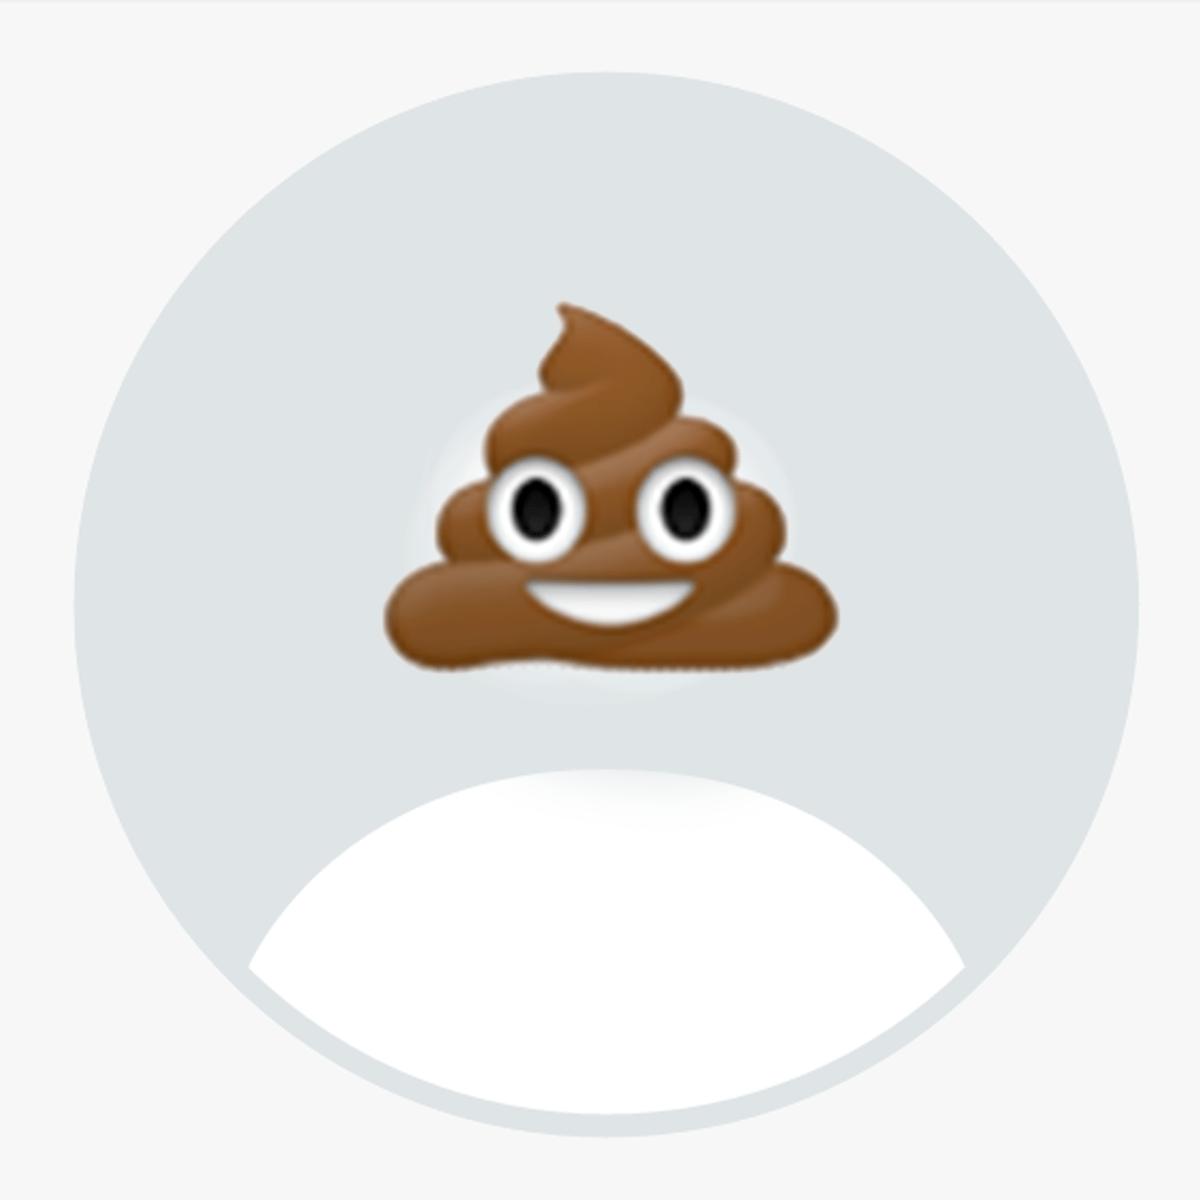 Profilbilder whatsapp coole Whatsapp Coole